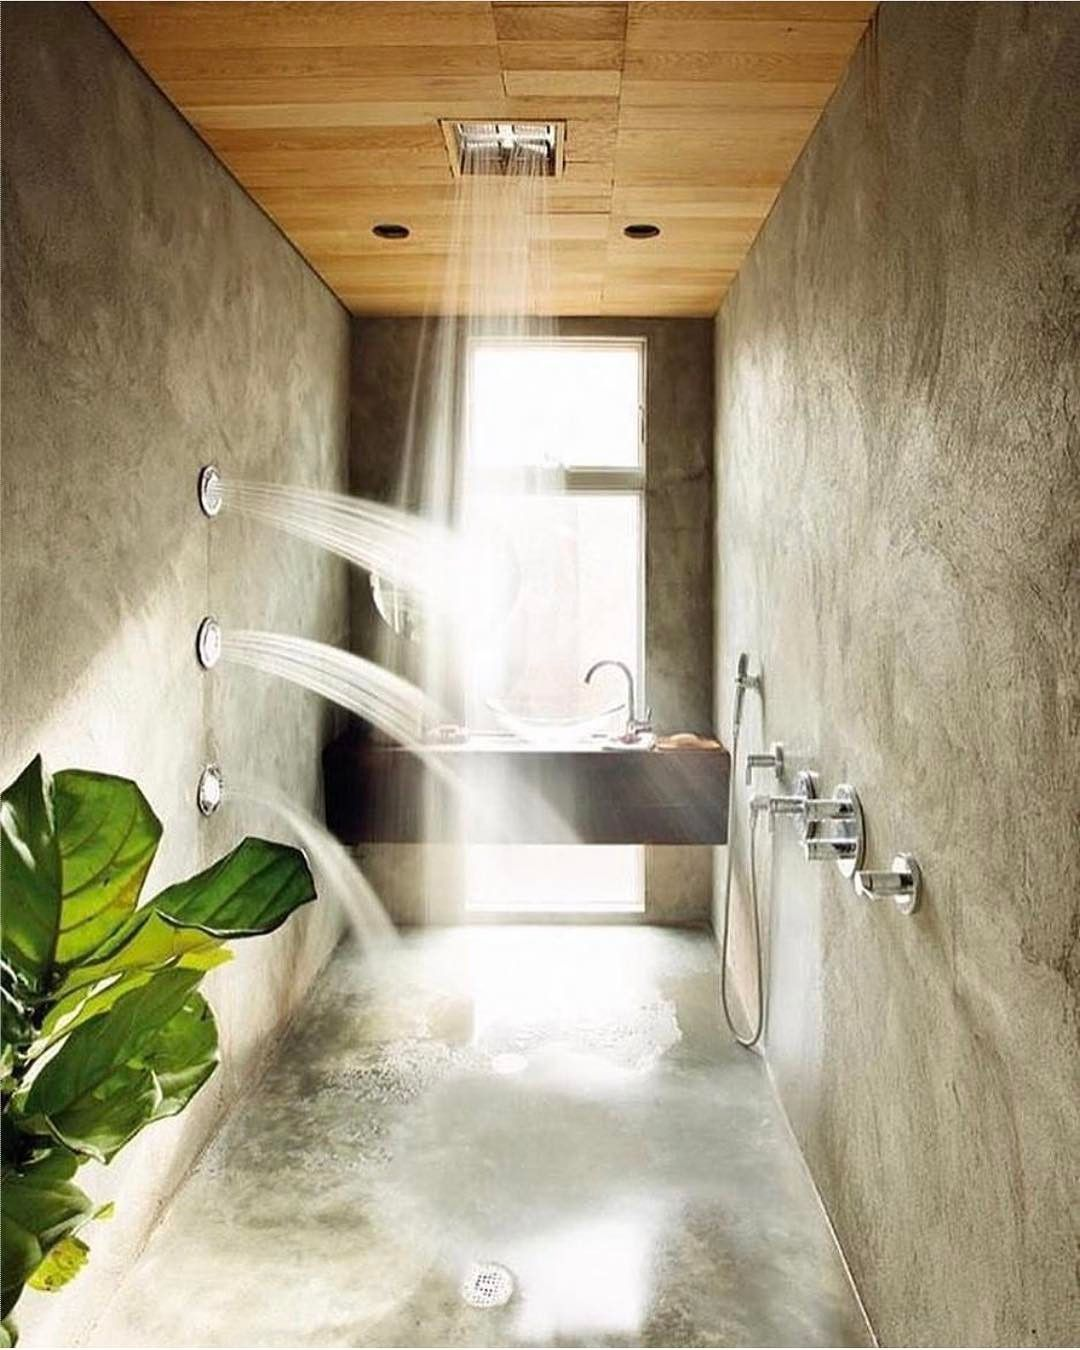 Surprising 29 Beegcom Home Decor Catalogs Online, Best Furniture Us #homedecorjakarta #raedunnhalloween #homedecora